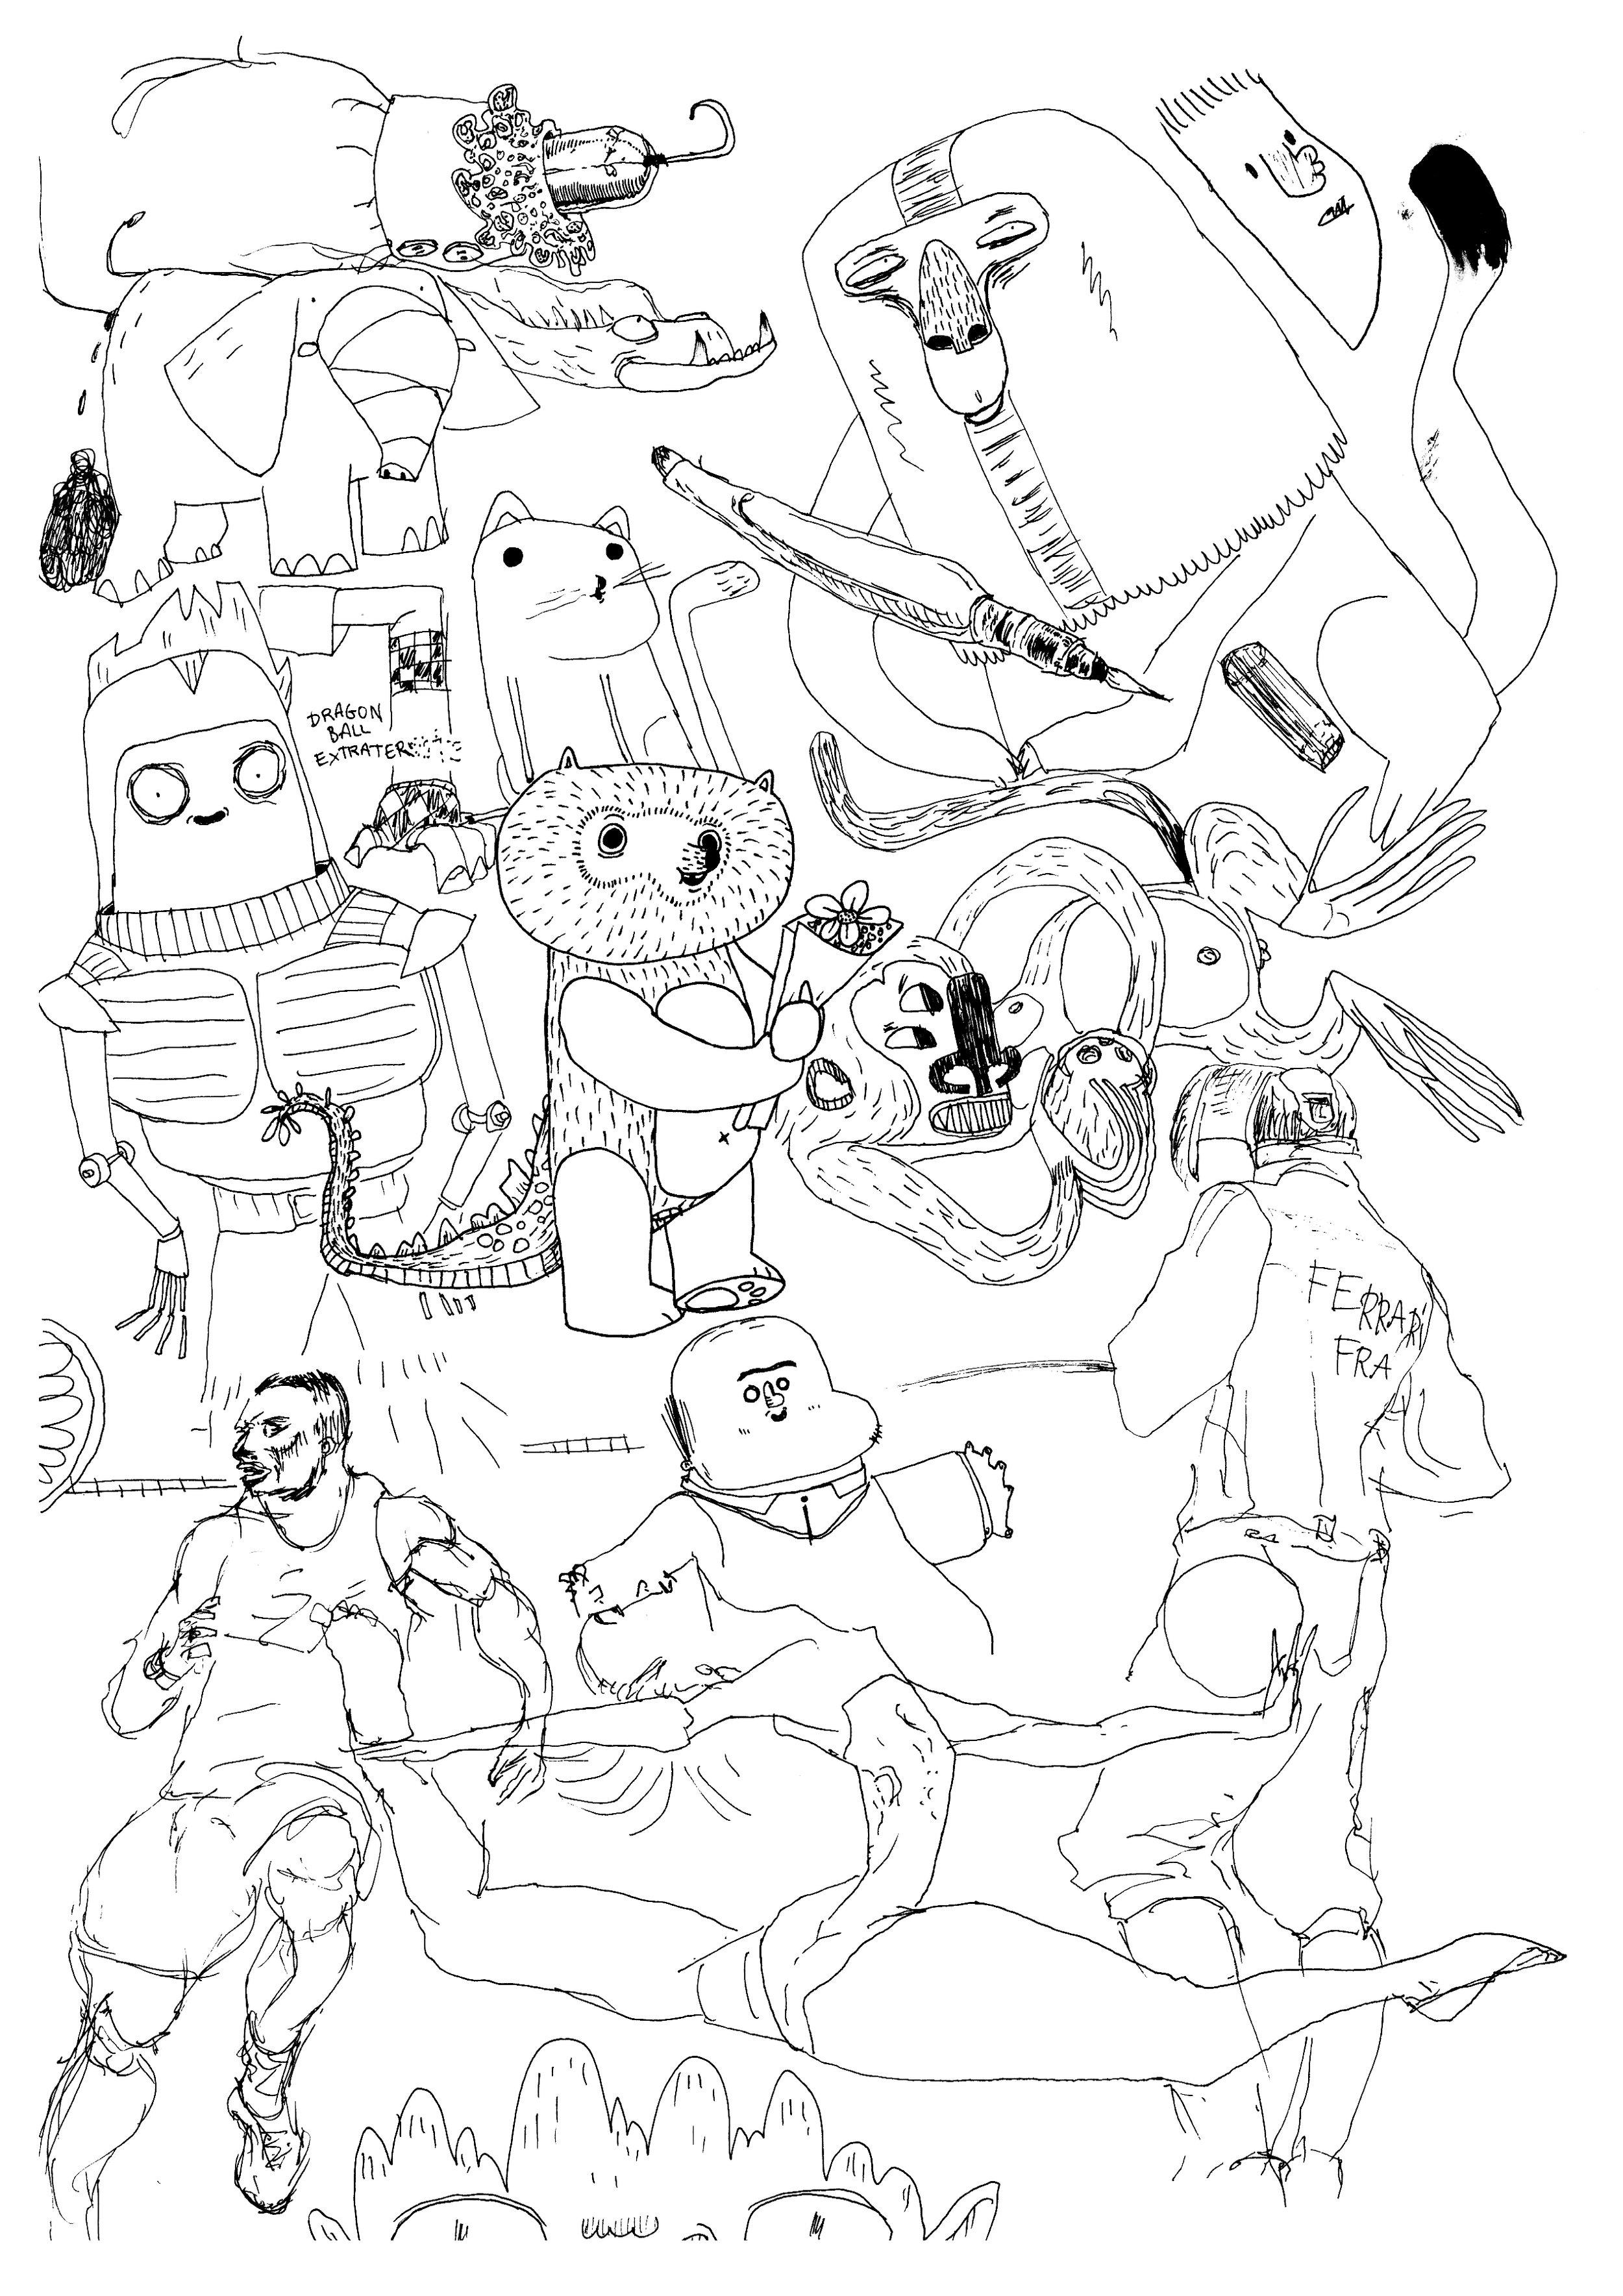 Pascal_Zaffiro_Doodle_15.jpg